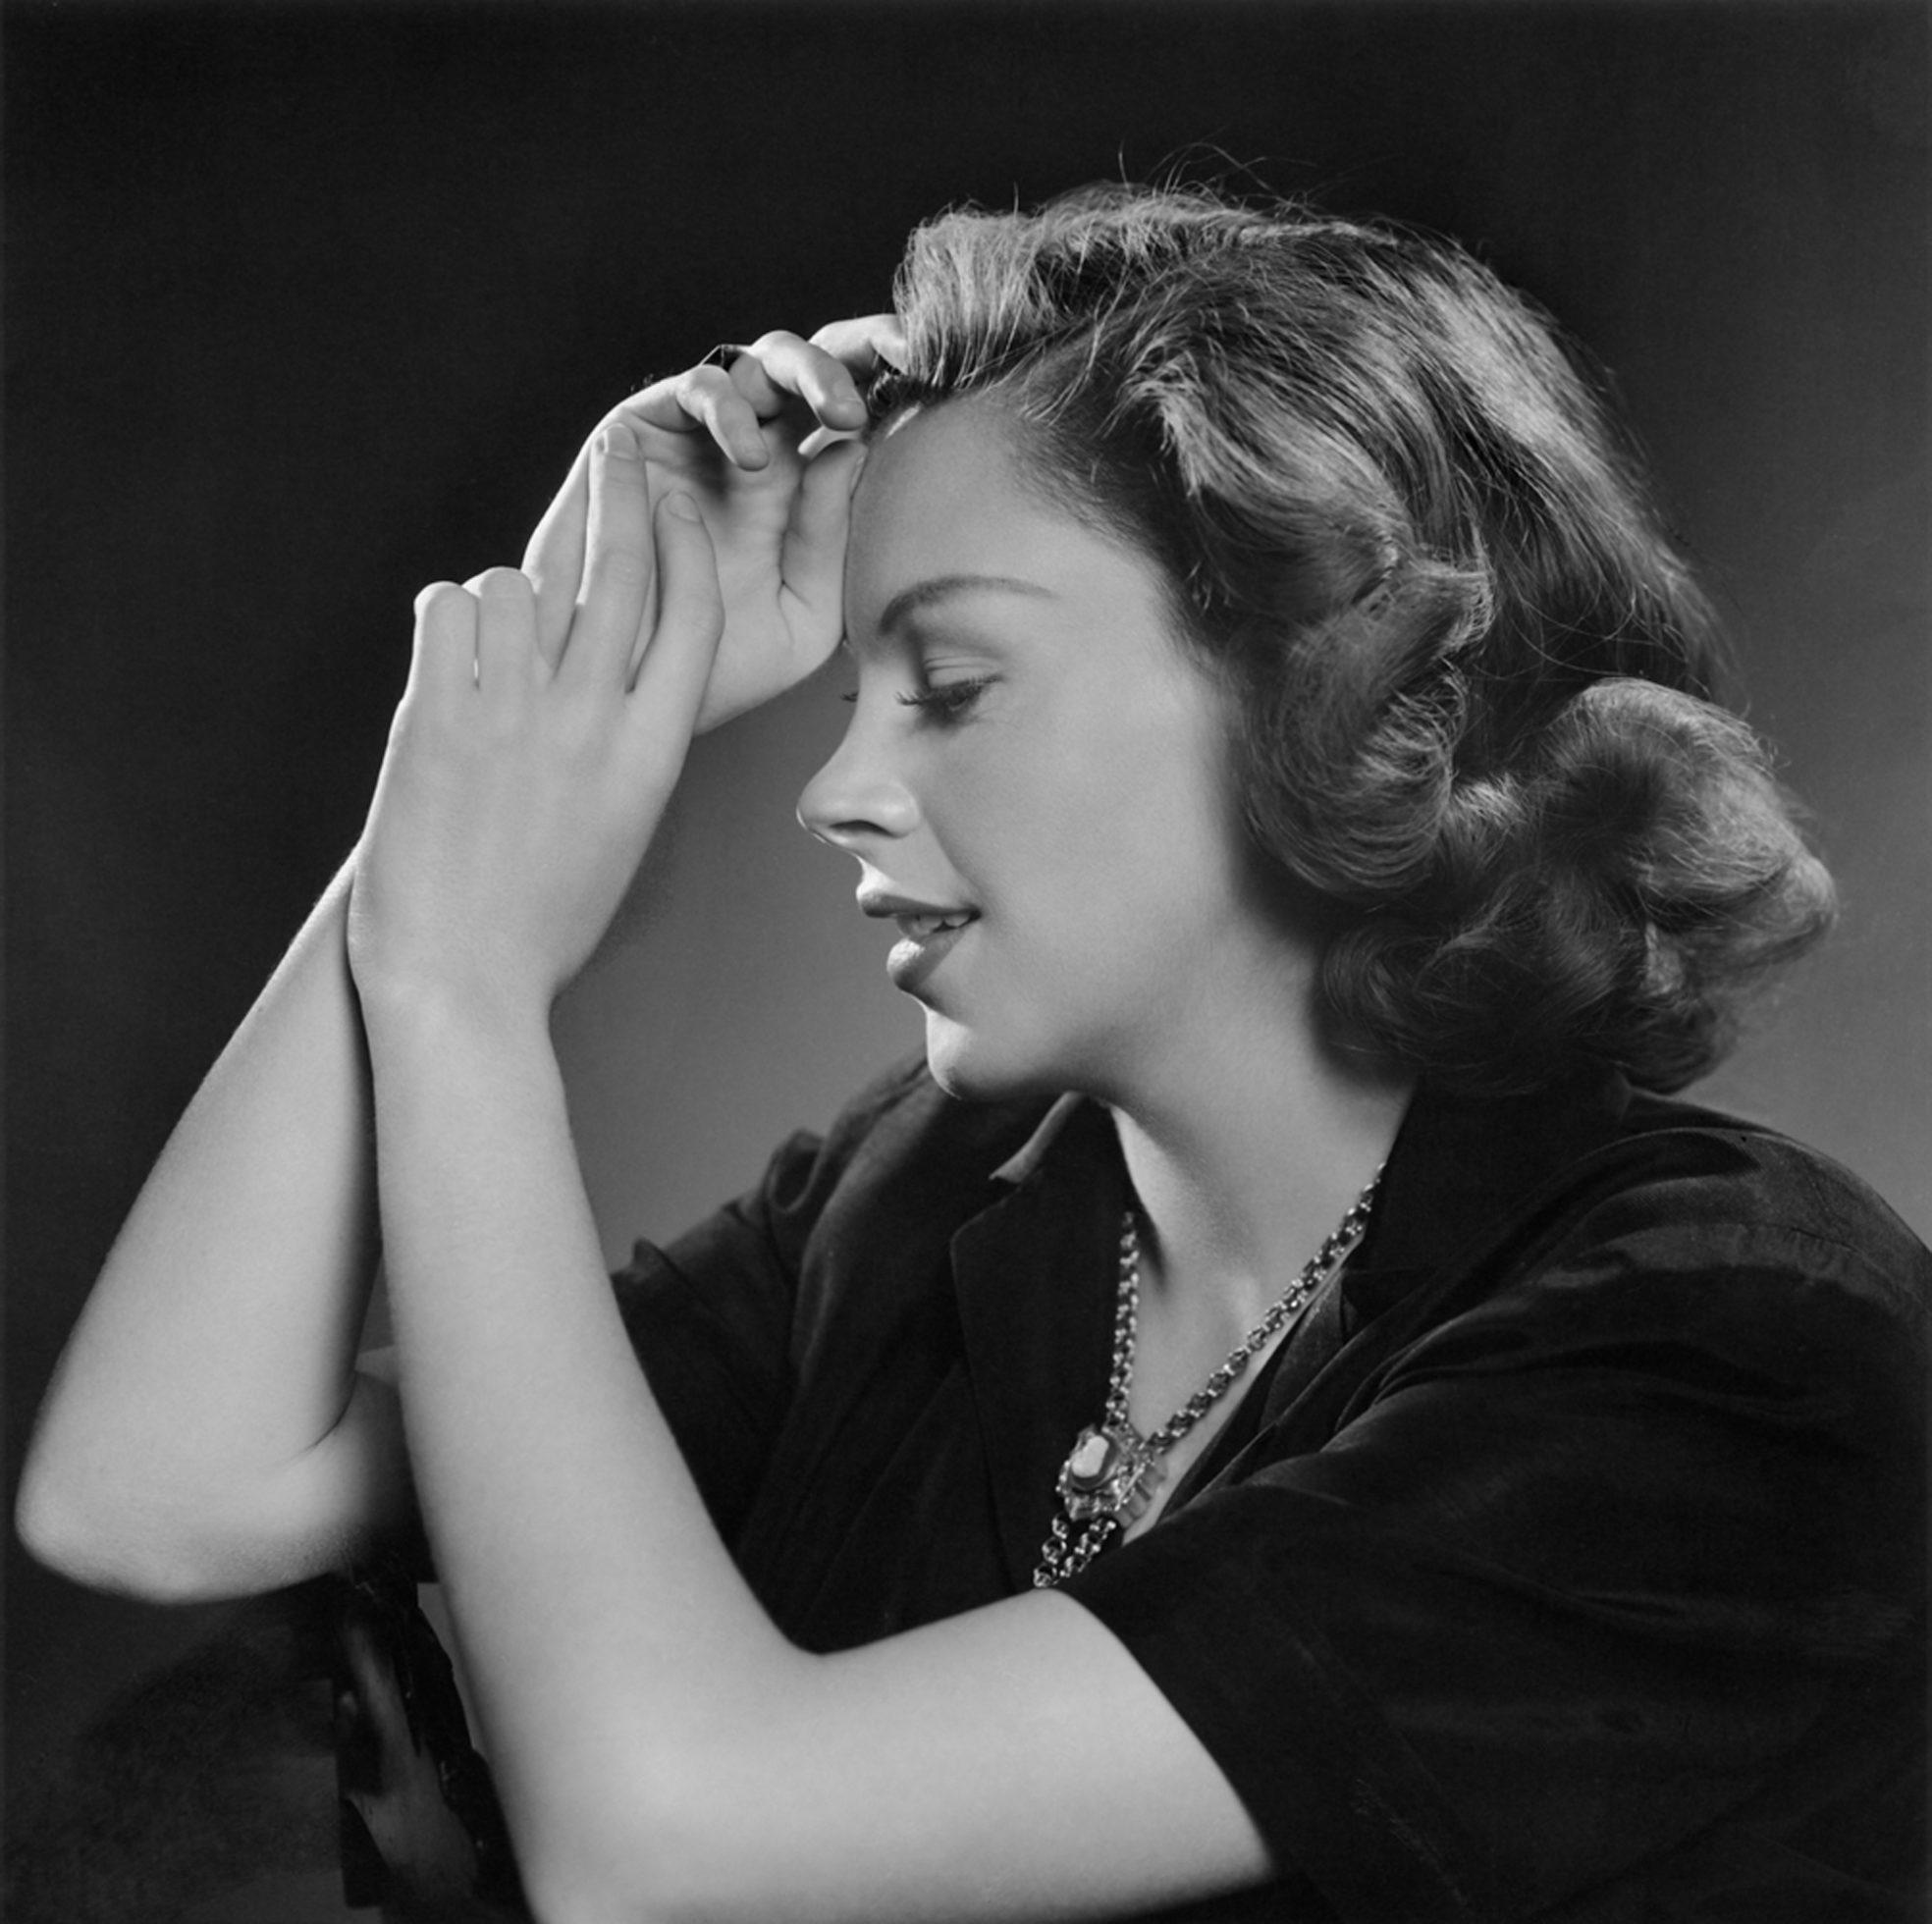 Fotó: Yousuf Karsh: Judy Garland, 1946 © Yousuf Karsh